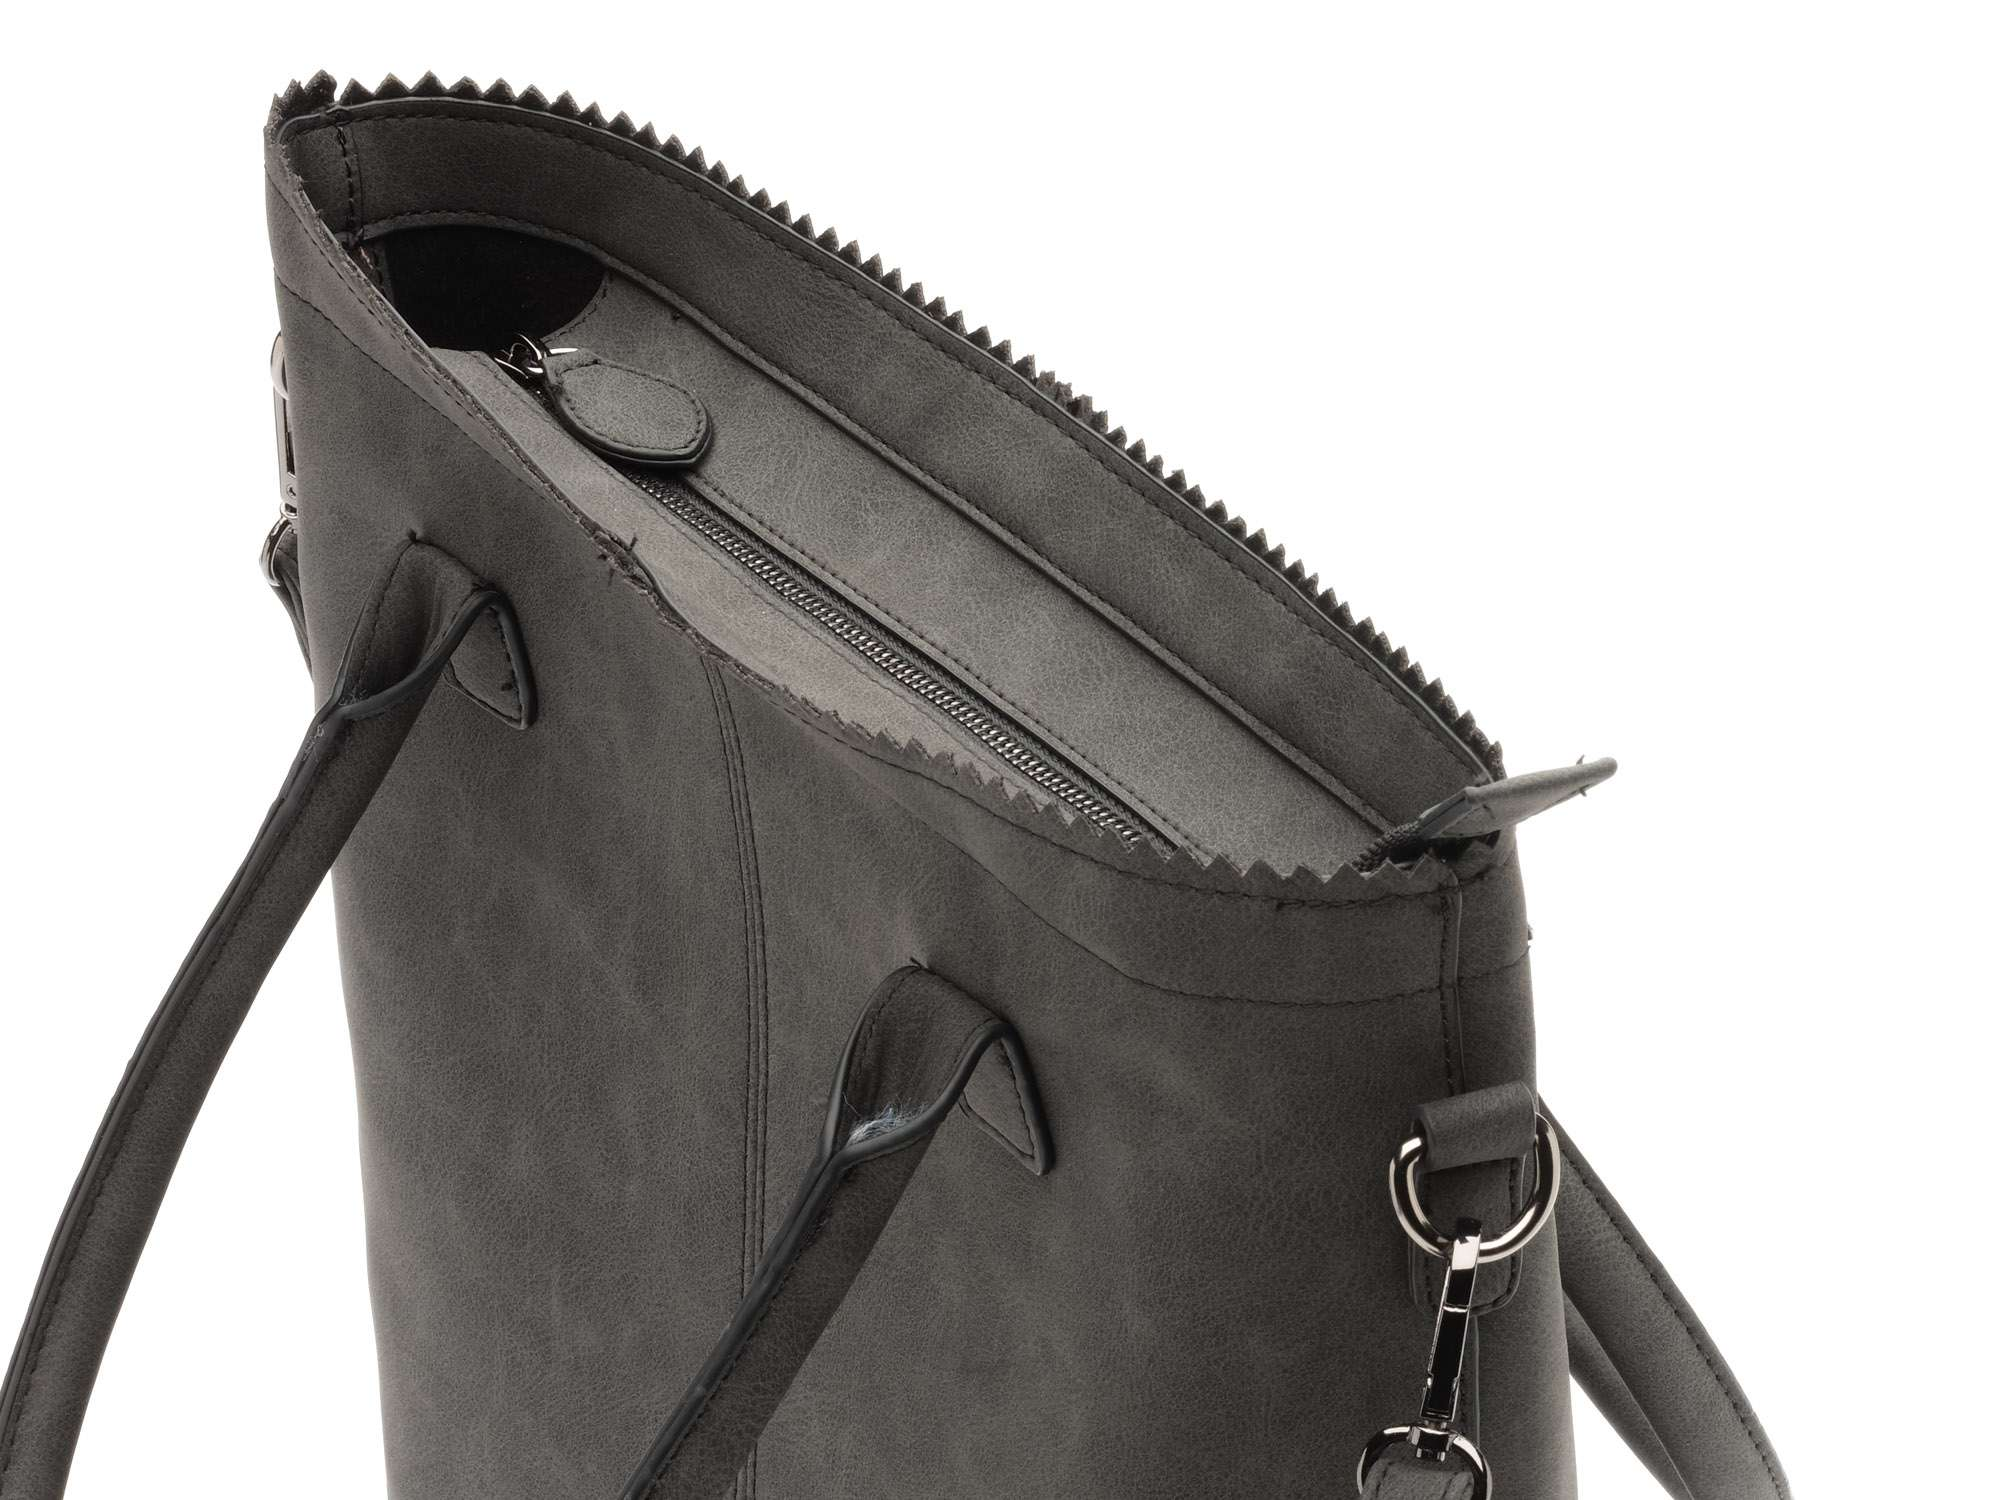 9974960acf3 Zebra natural bag met rits - camel - Purdies sieraden & tassen